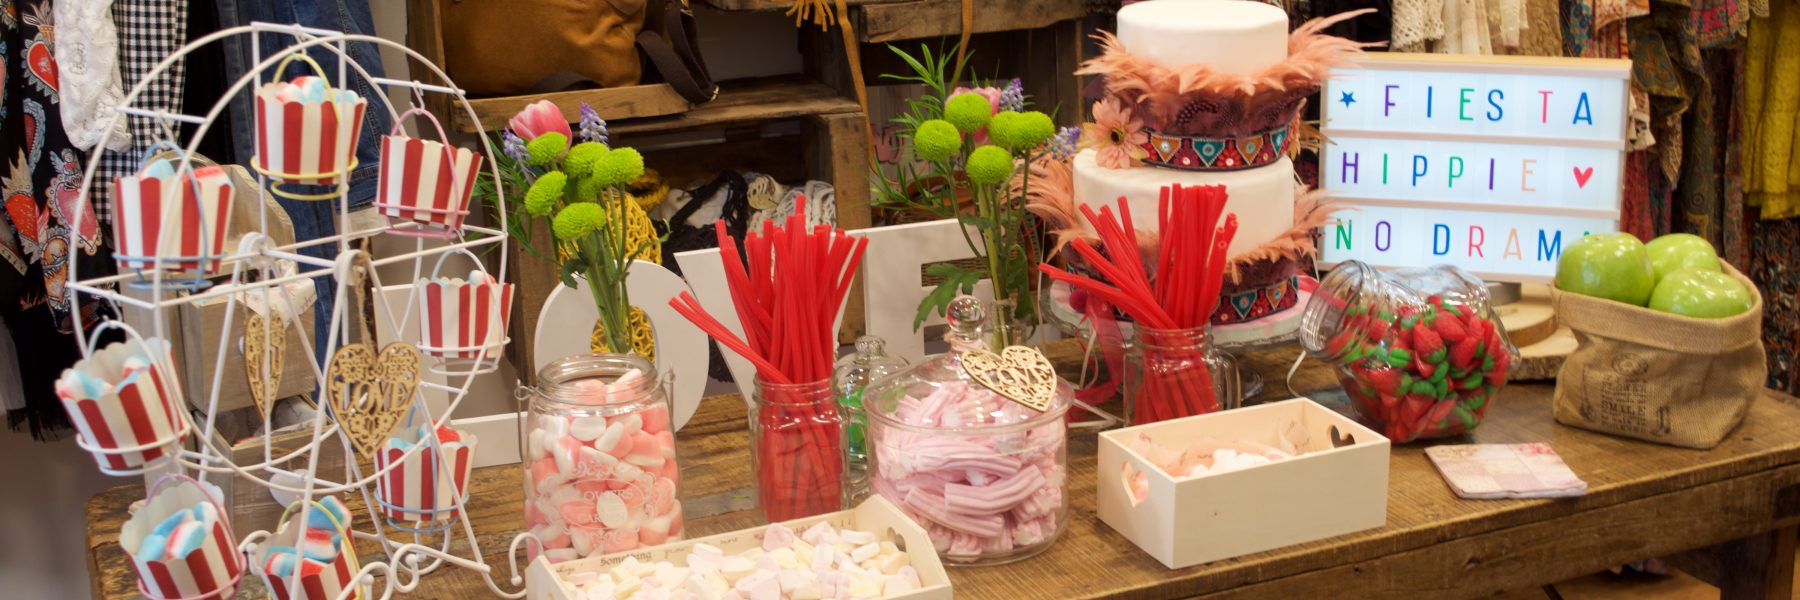 "Candy-bar Tienda ""No Drama"""